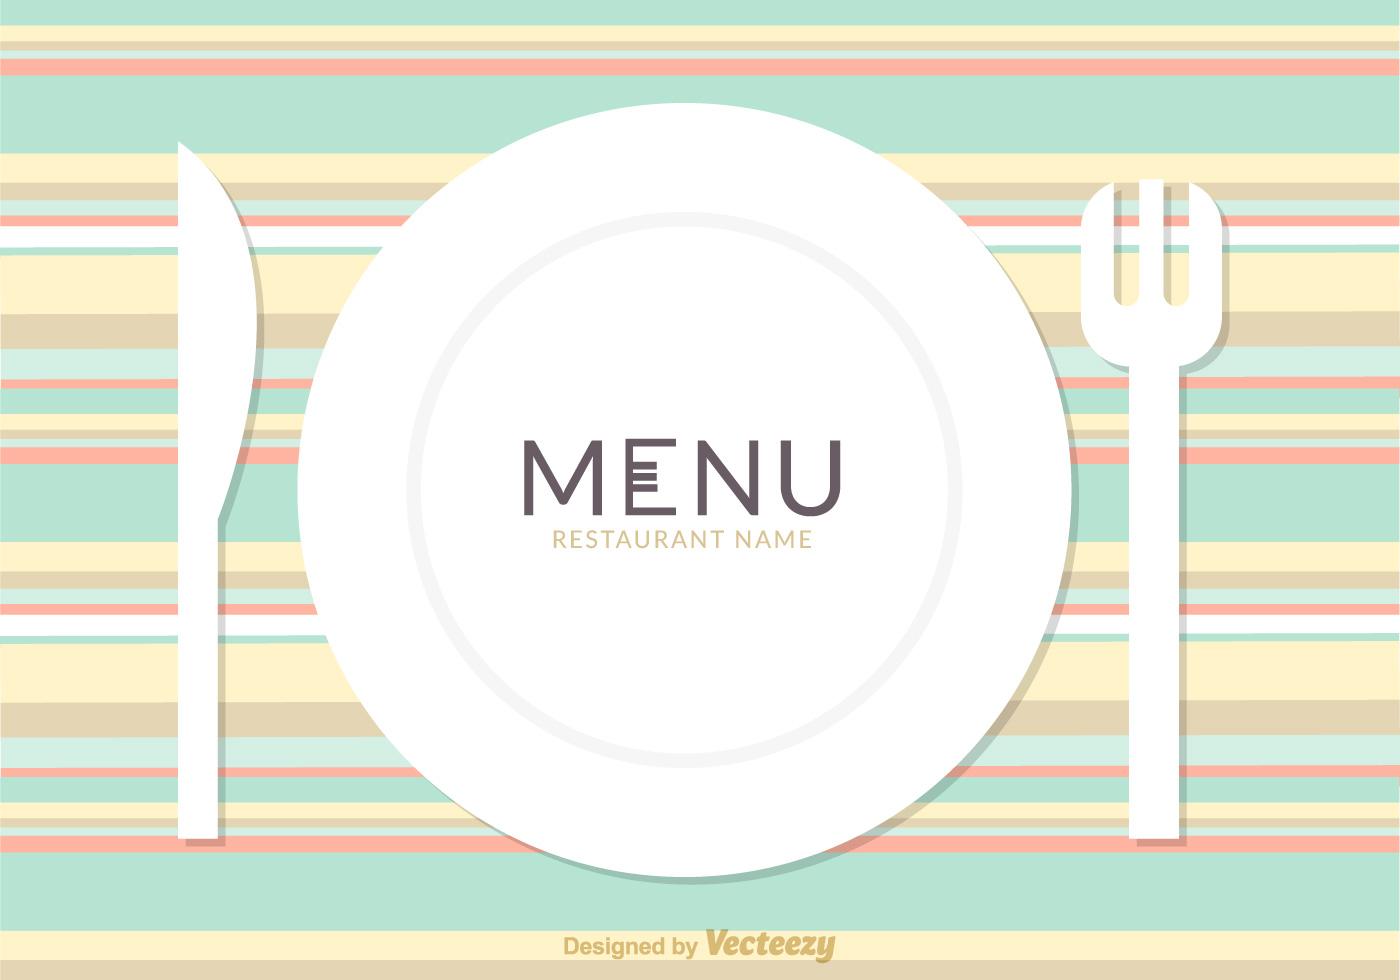 Free Restaurant Menu Card Vector Design Download Free Vector Art Stock Graphics Amp Images